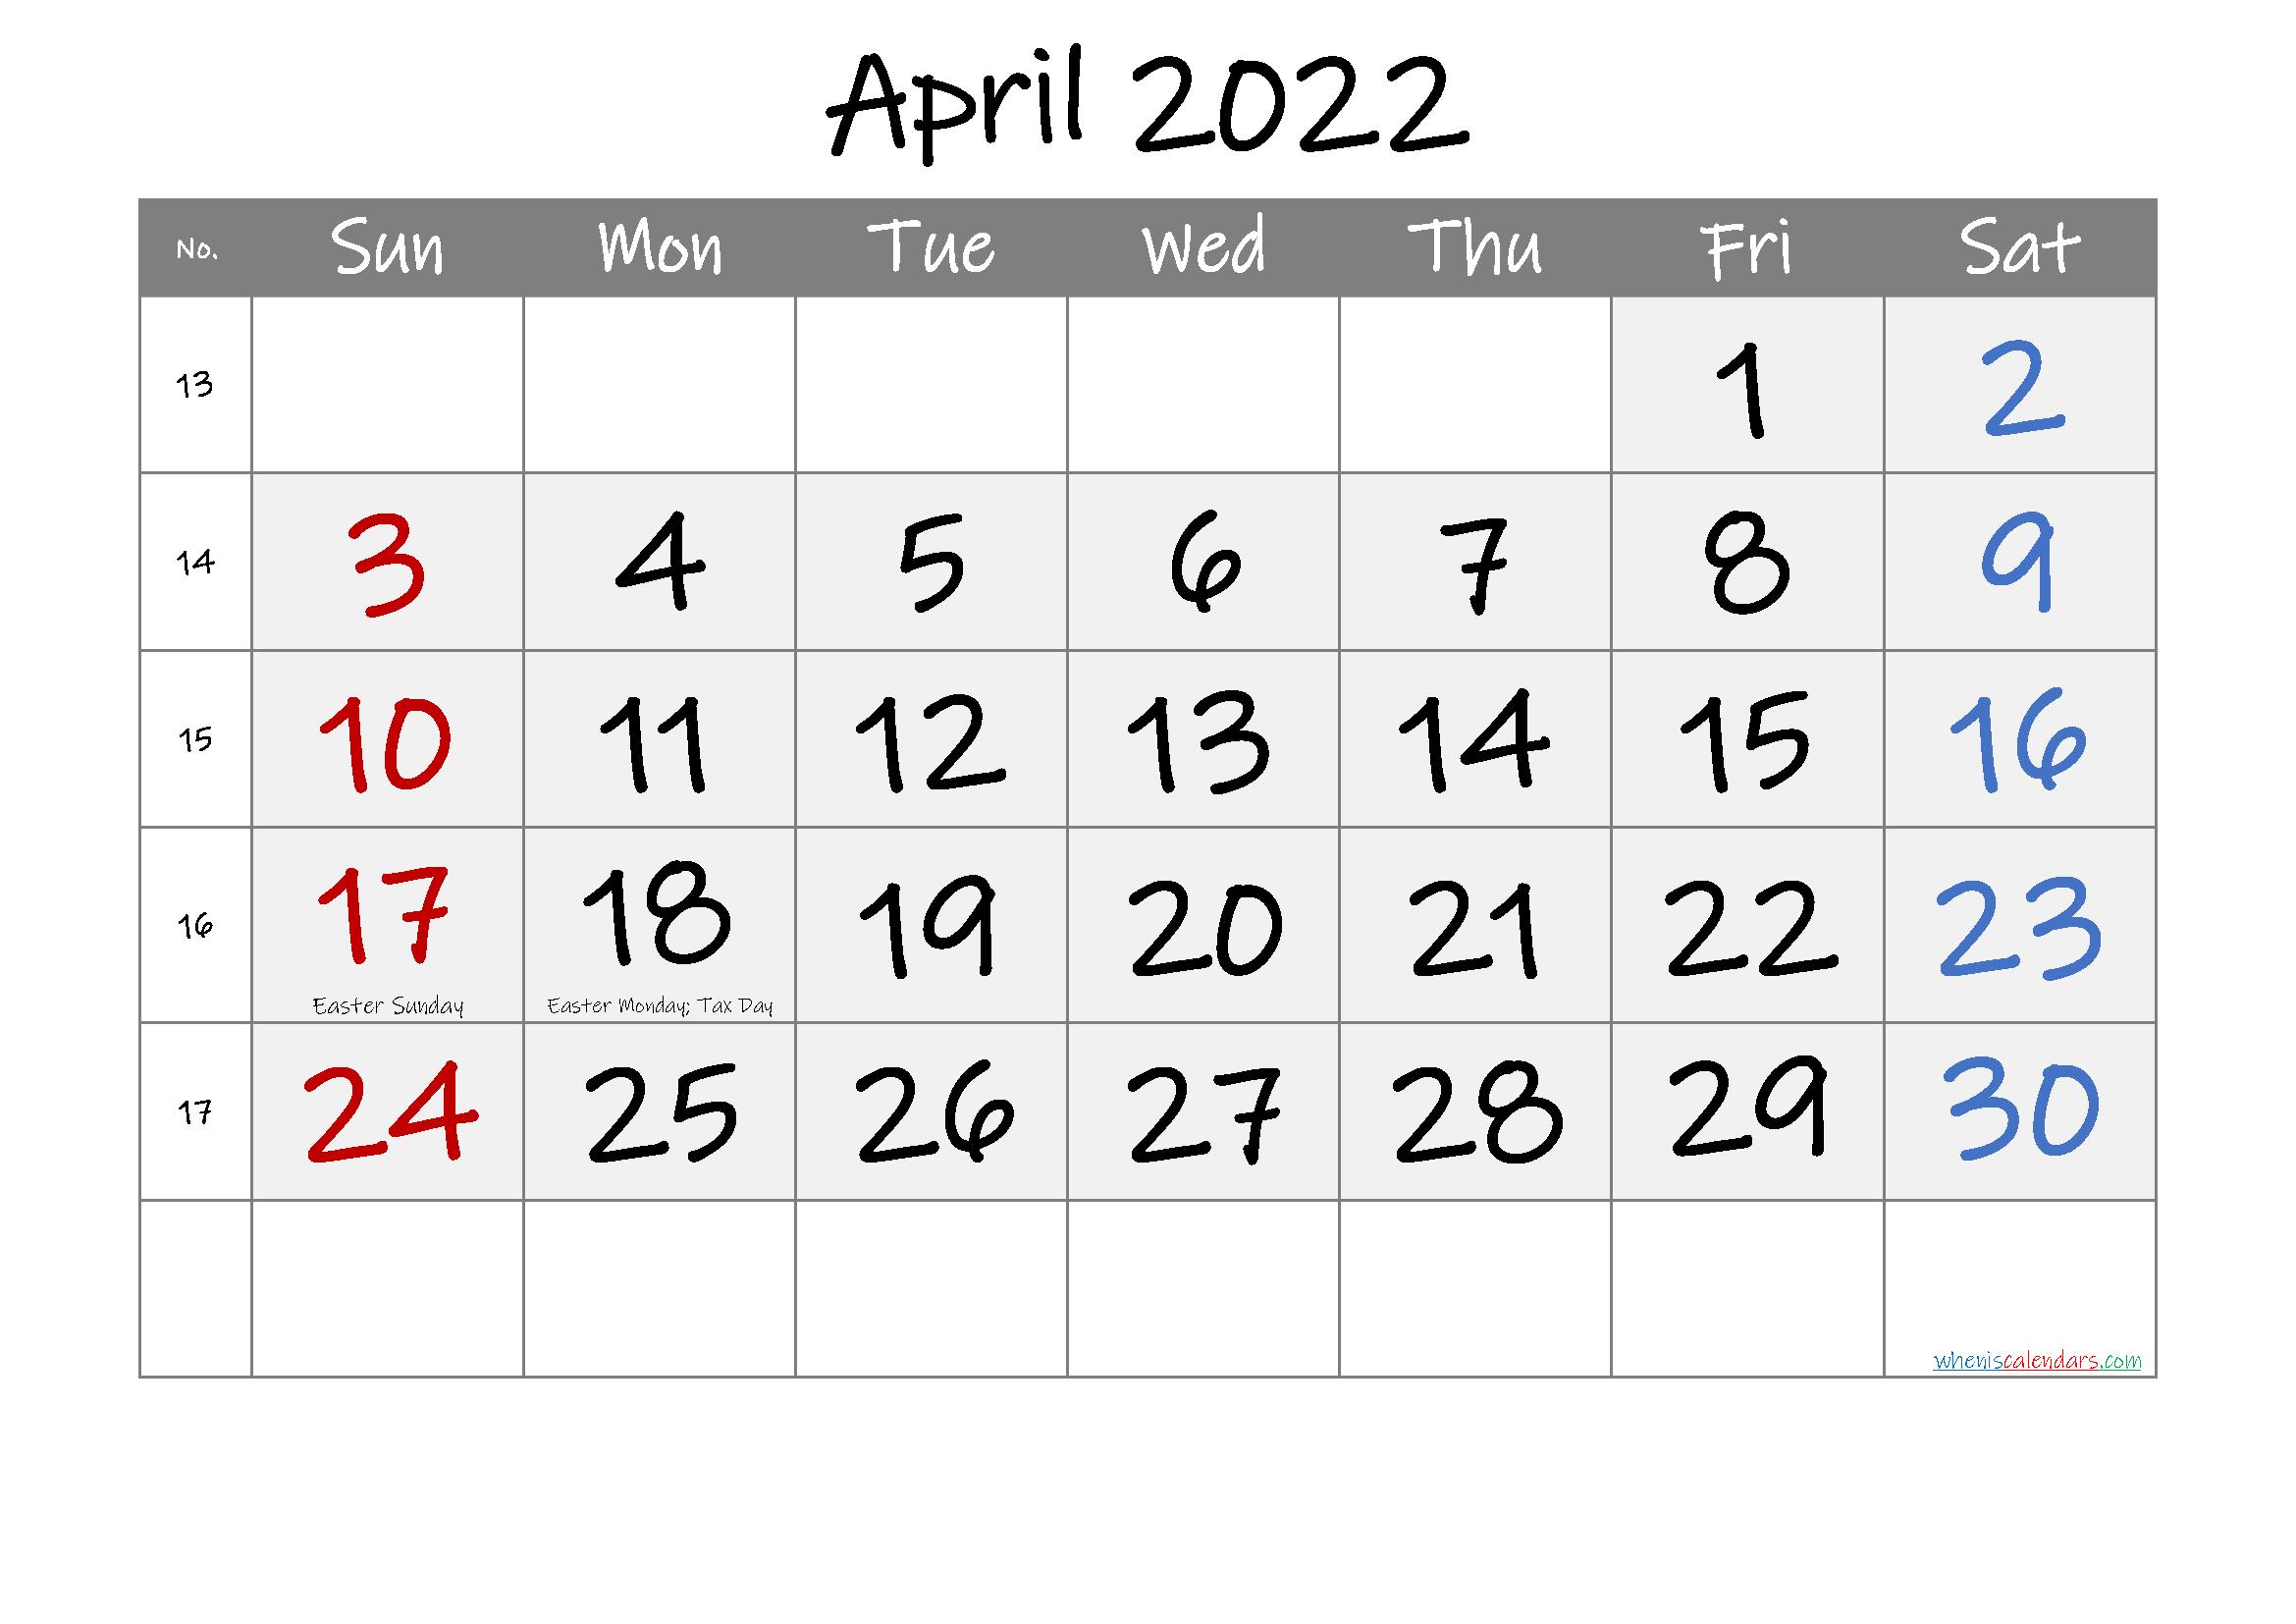 Free Printable April 2021 Calendar With Holidays within Printable April 2022 Calendar Template Free